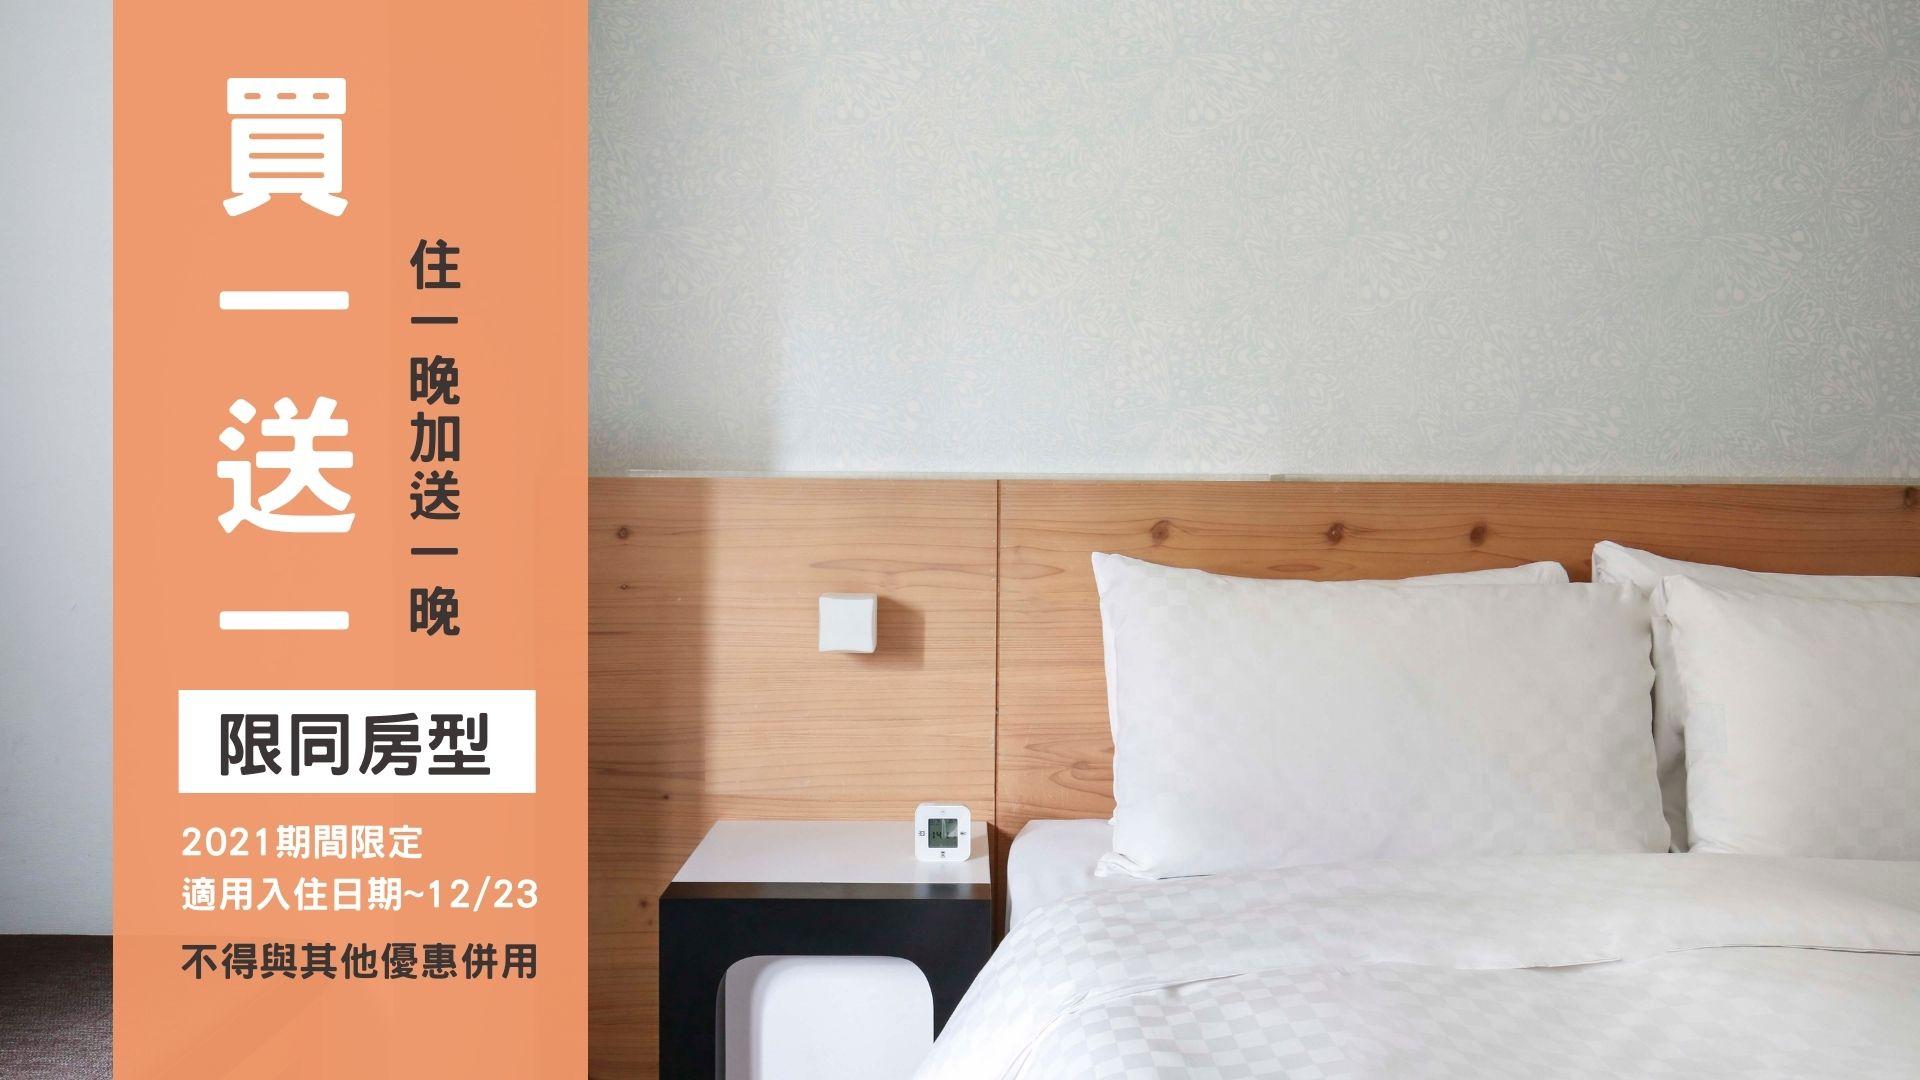 https://booking.taipeiinngroup.com/nv/images/suite/1011.jpg